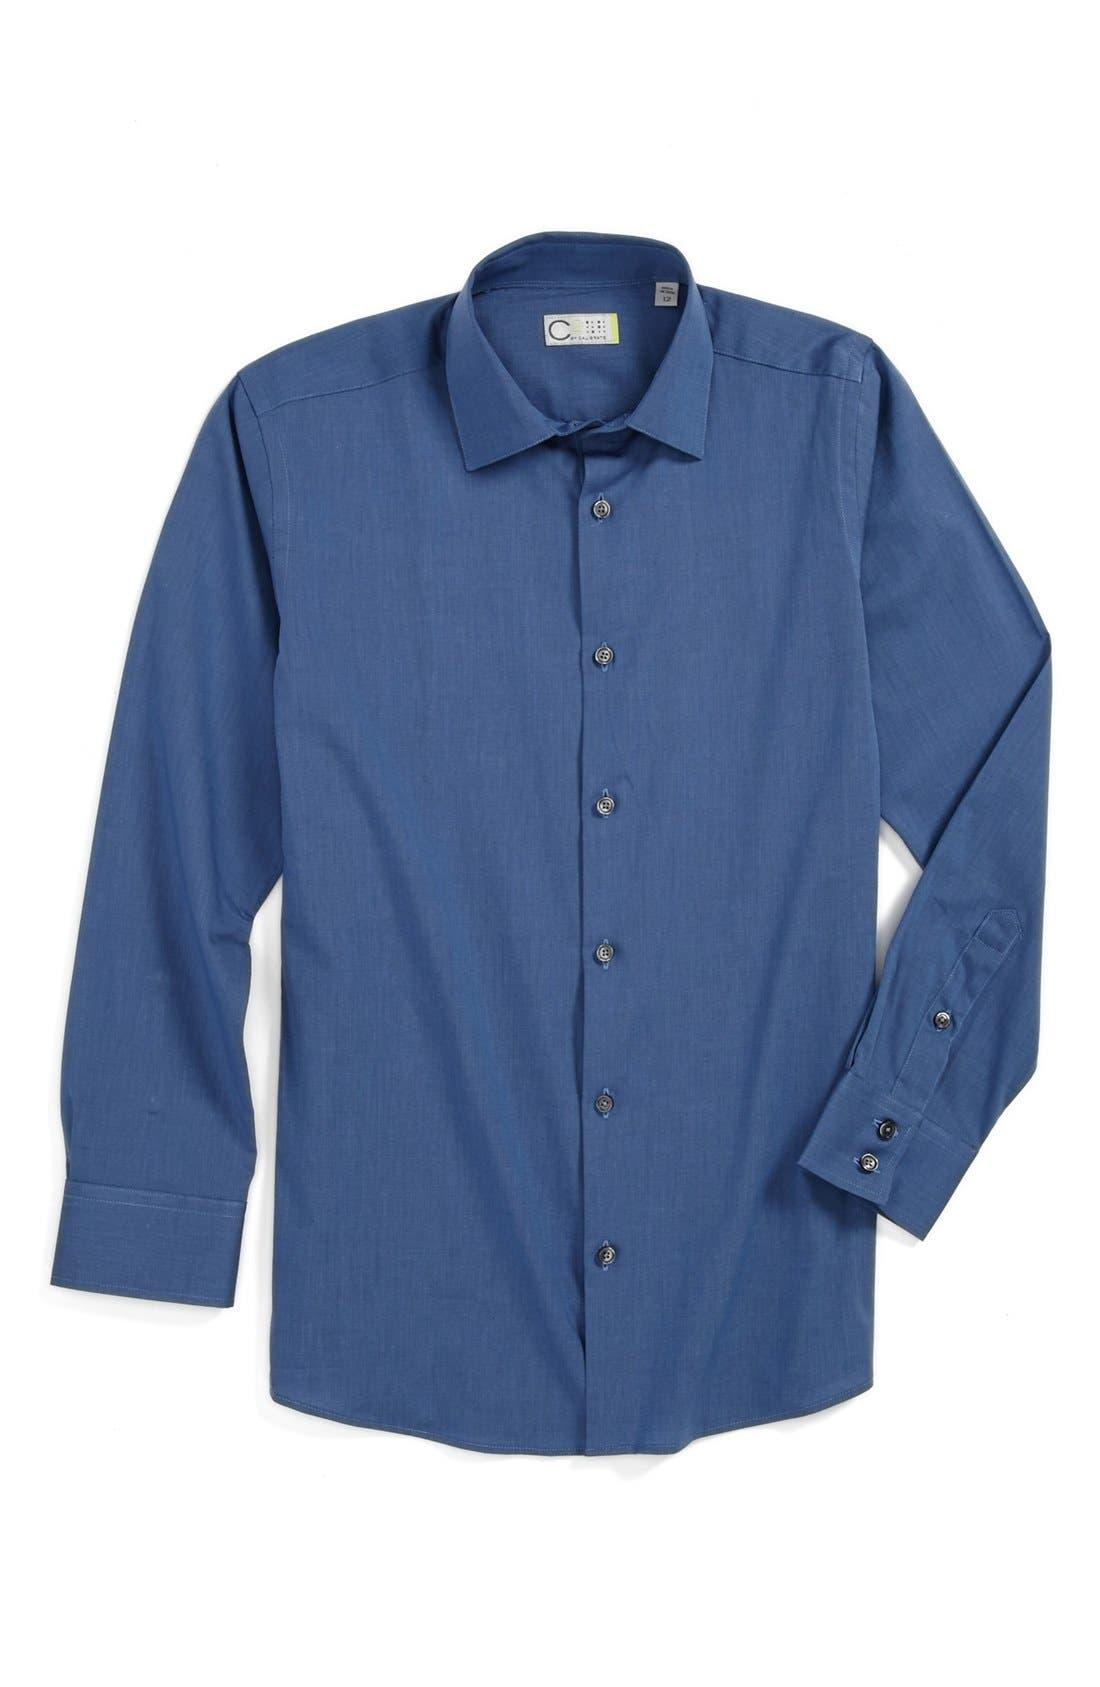 Alternate Image 1 Selected - C2 by Calibrate 'Carter' Dress Shirt (Big Boys)